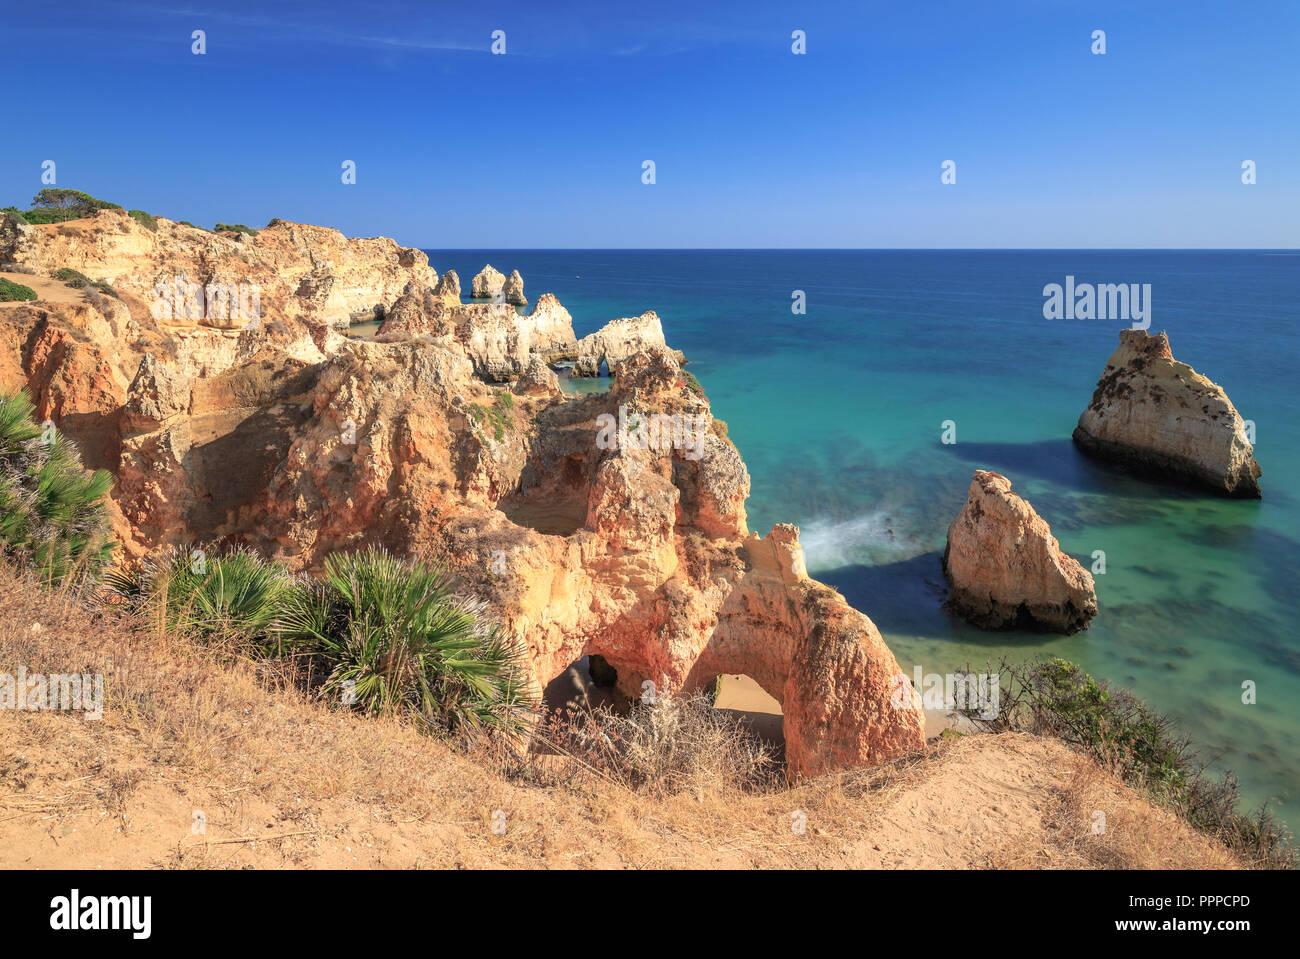 Rocks on the beach Praia dos tres Irmaos at the Algarve coast between Alvor and Portimao near Lagos - Stock Image